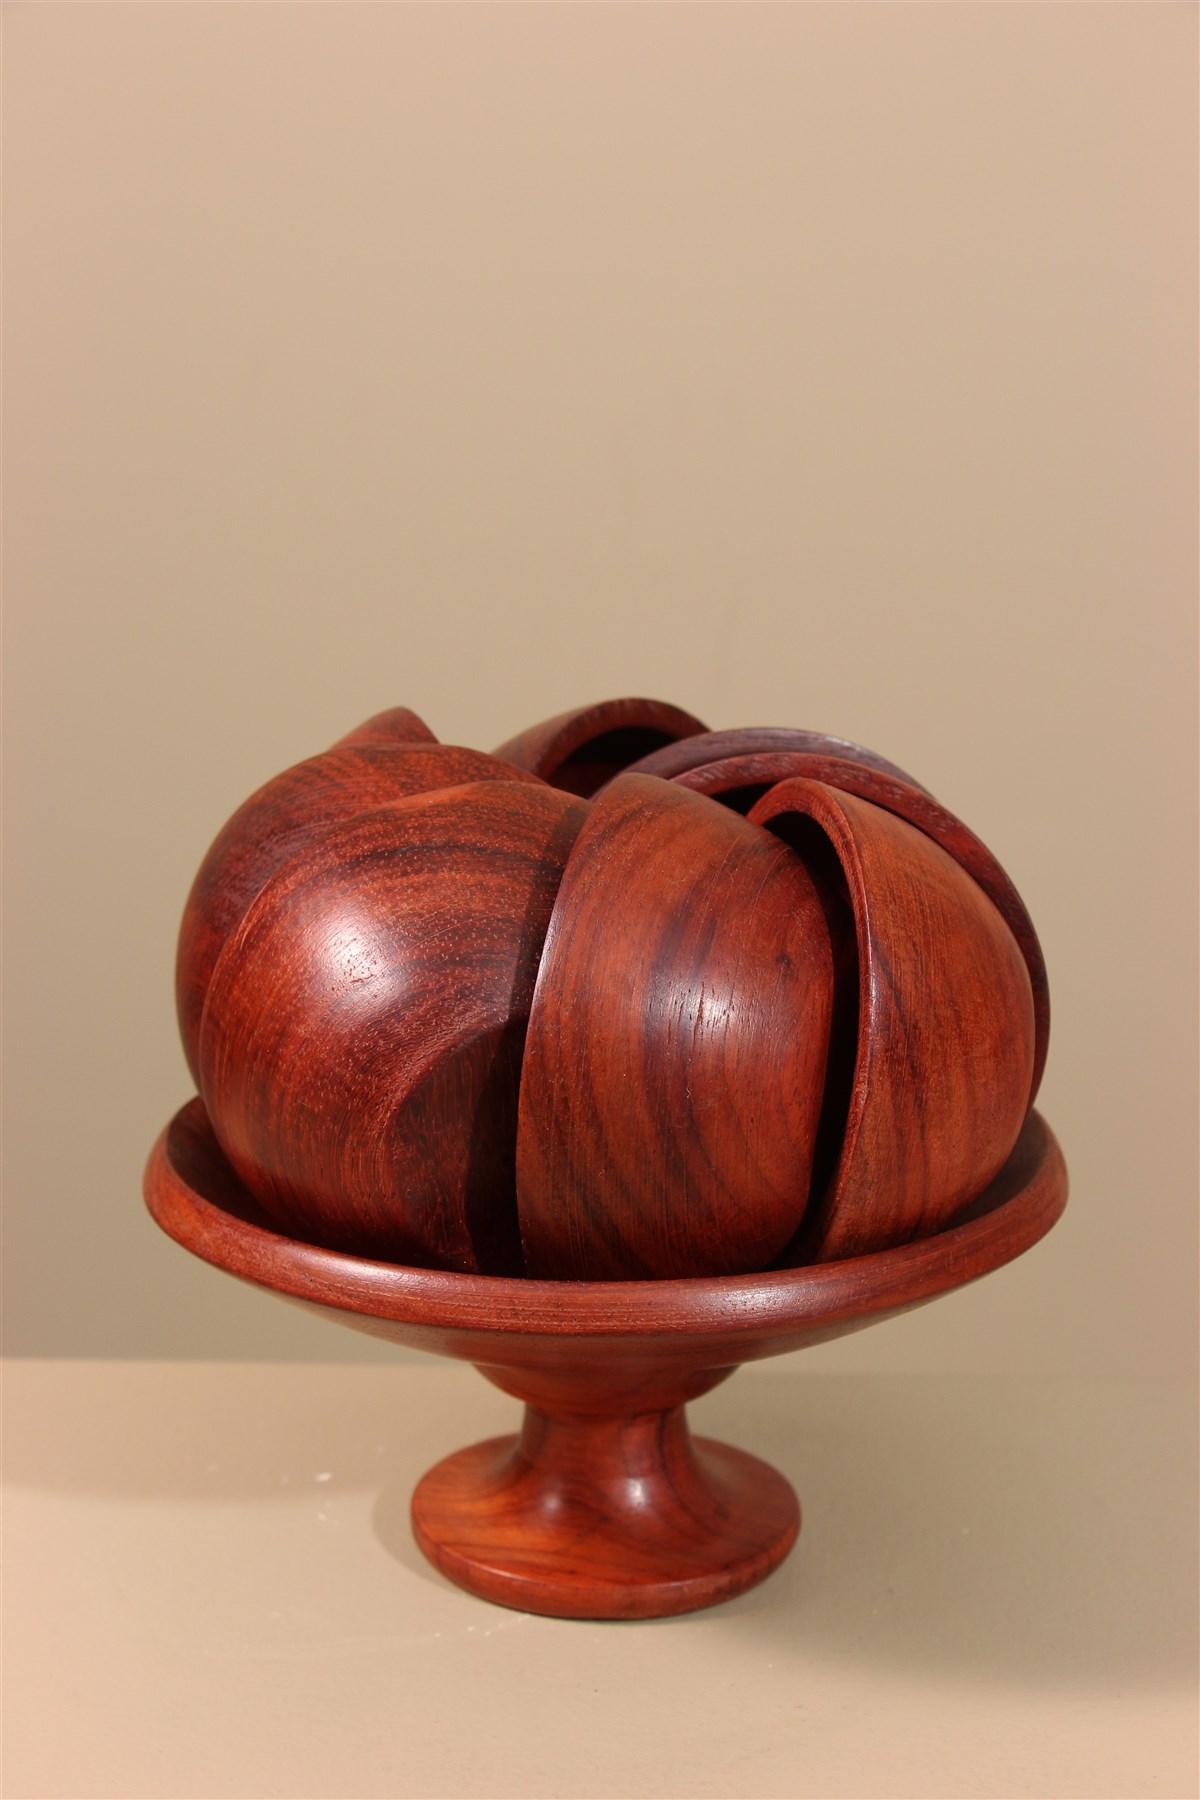 Set apéritif artisanat africain - Déco africaine - Art africain traditionnel